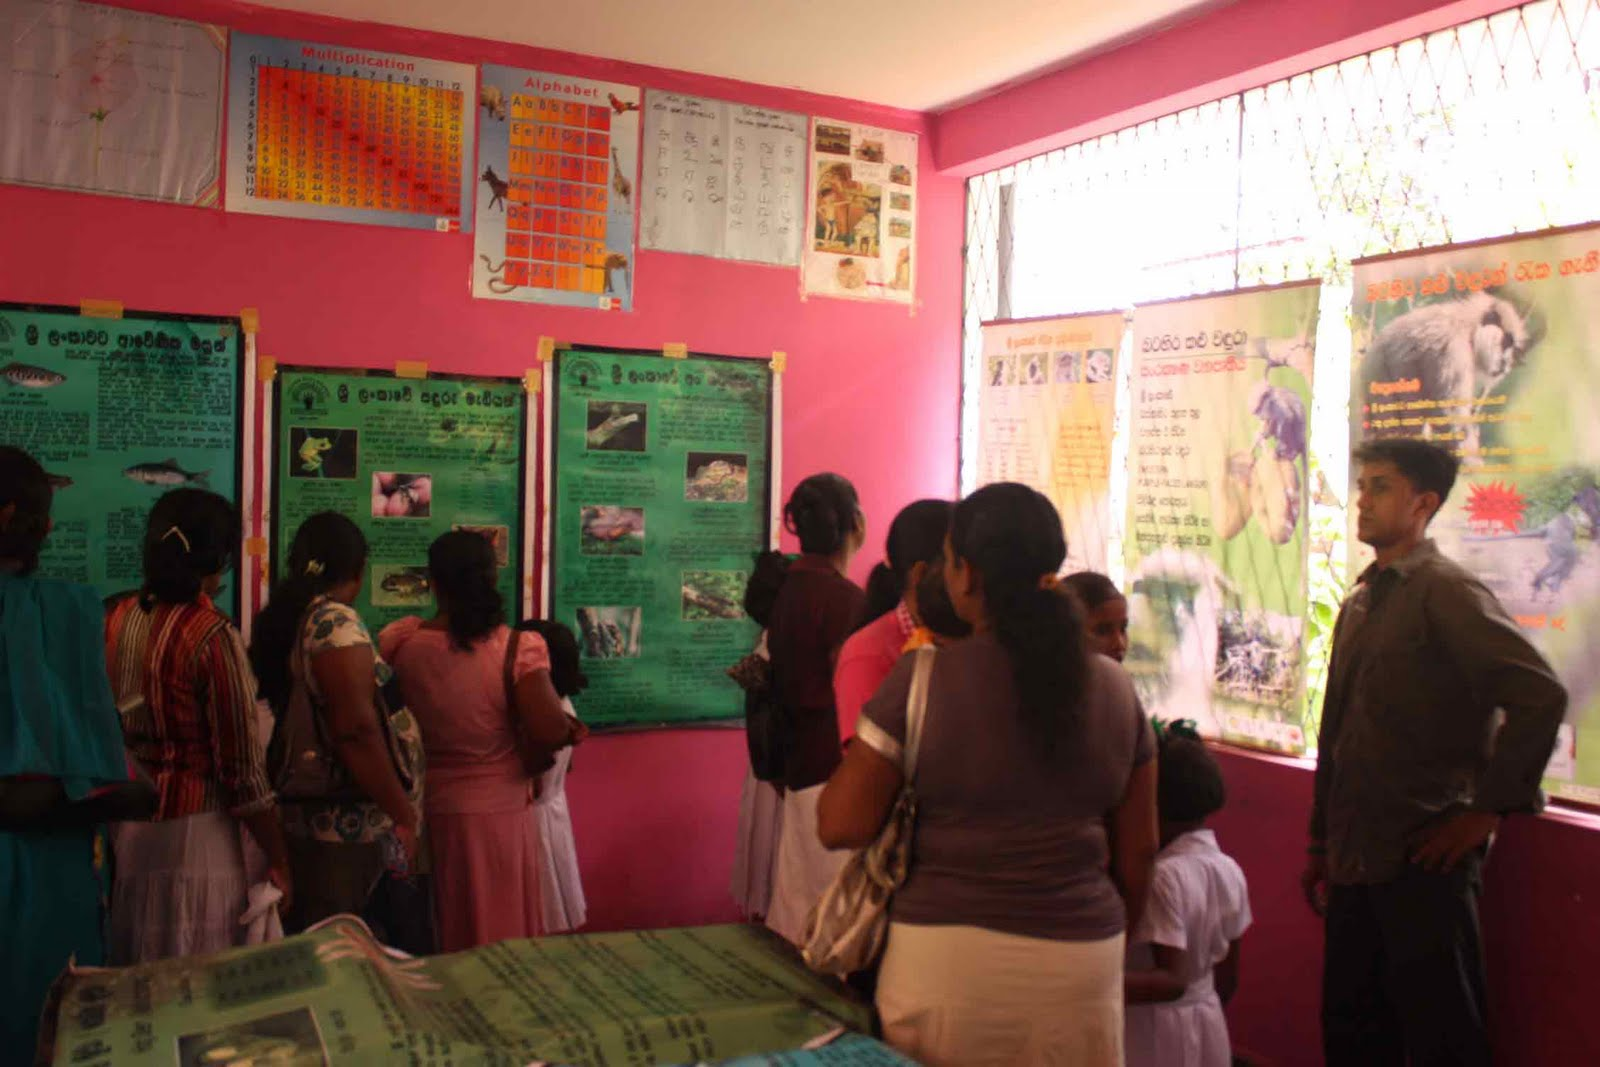 Education Exhibition Stall : Exhibition at the agamathi balika maha vidyalaya panadura